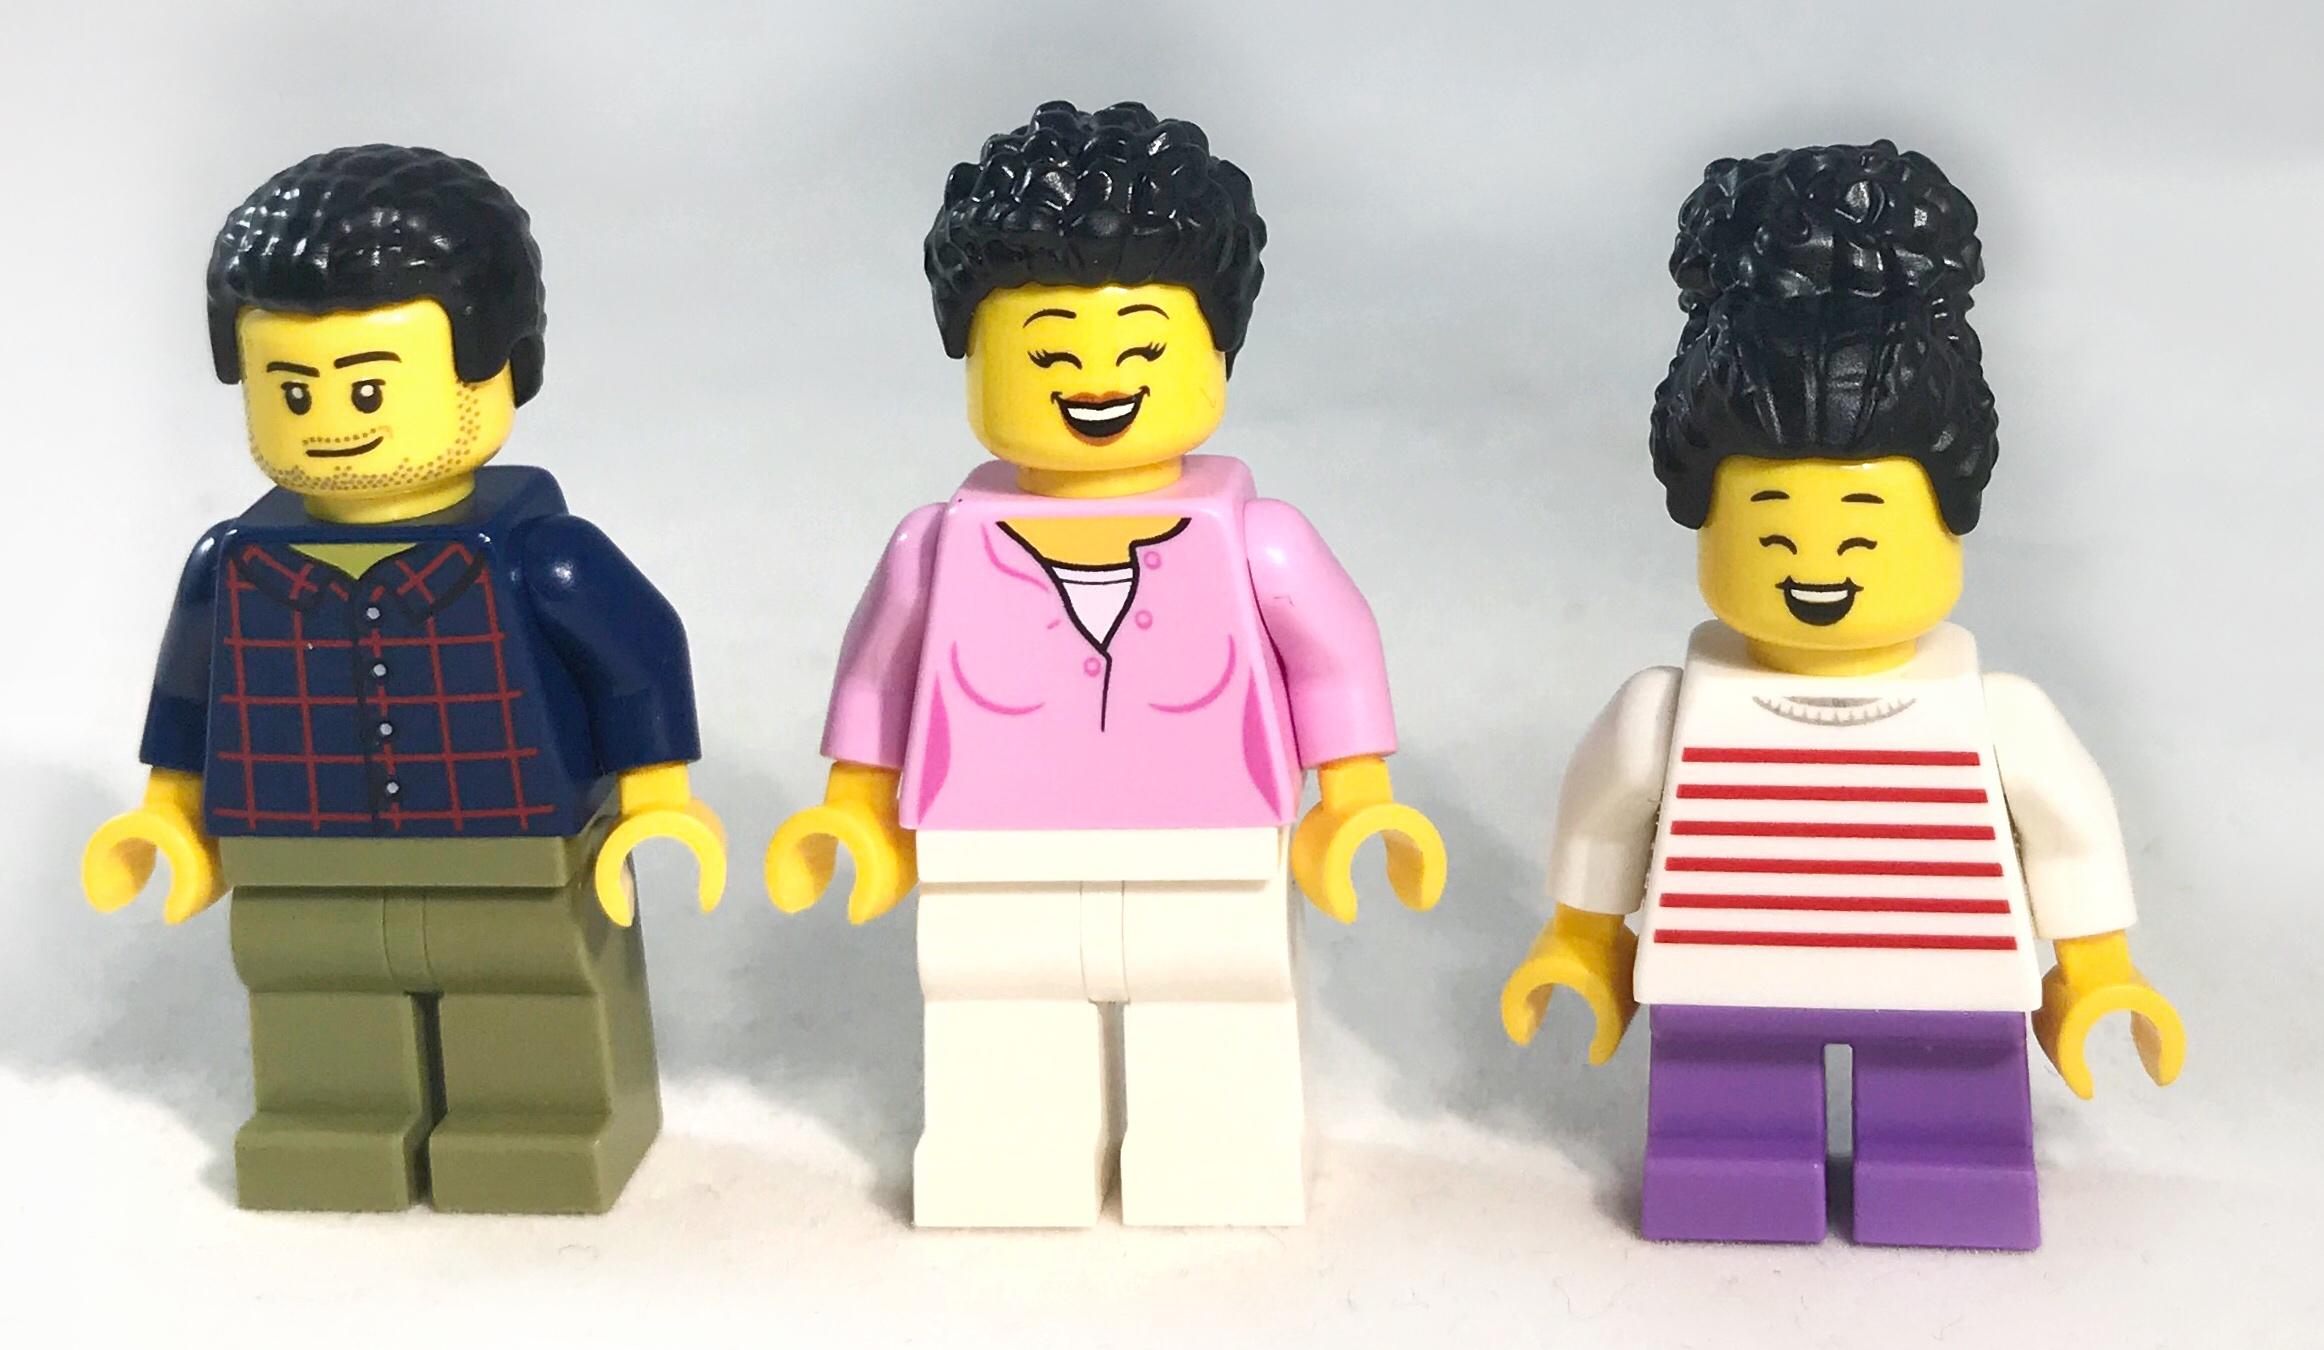 Lego 20 Black Minifigure Legs Boy Girl Pants City Figure Pieces